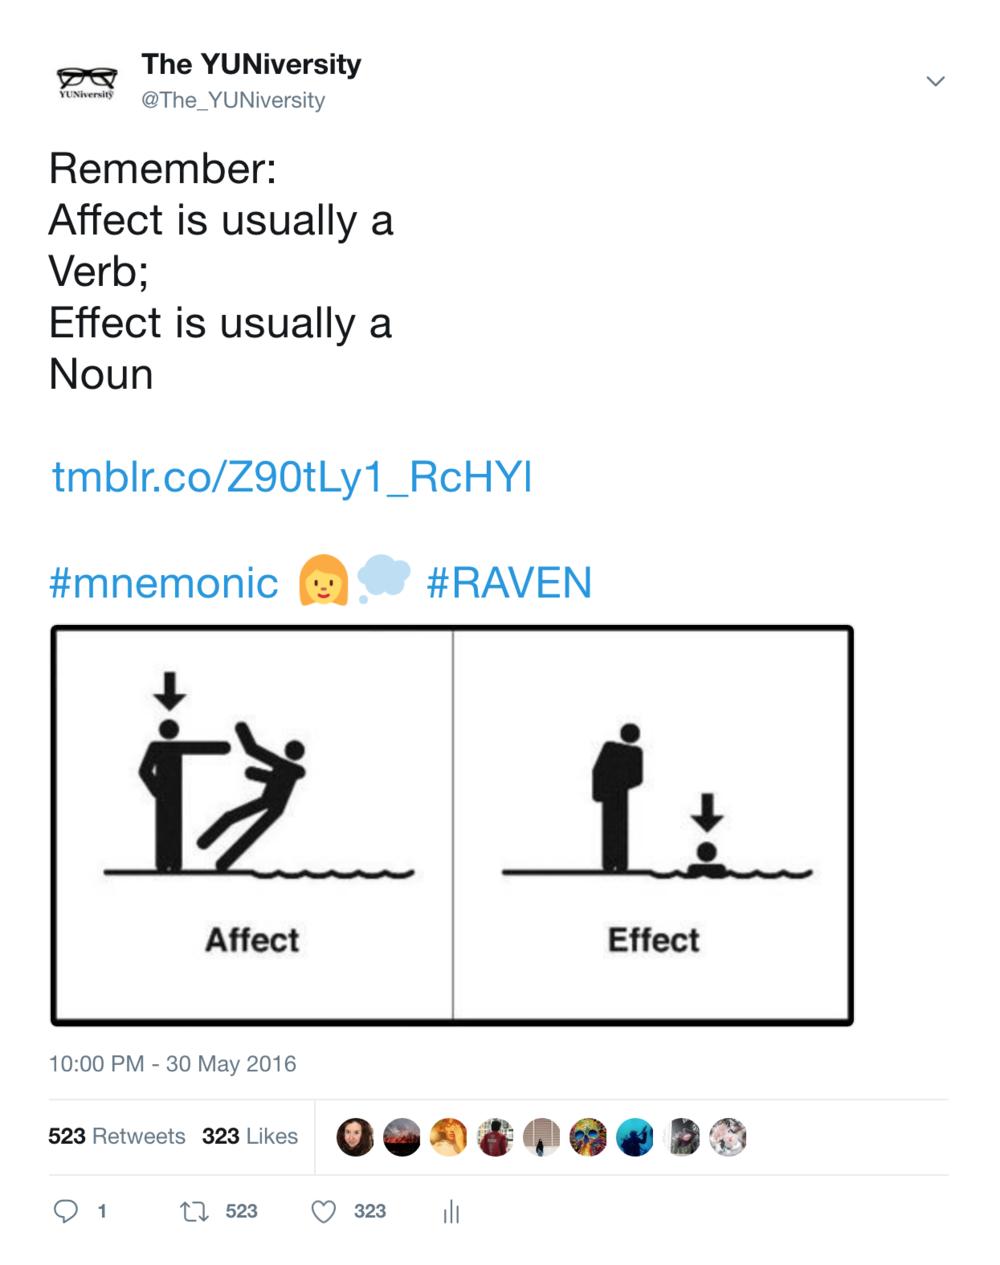 RAVEN is a helpful mnemonic. -